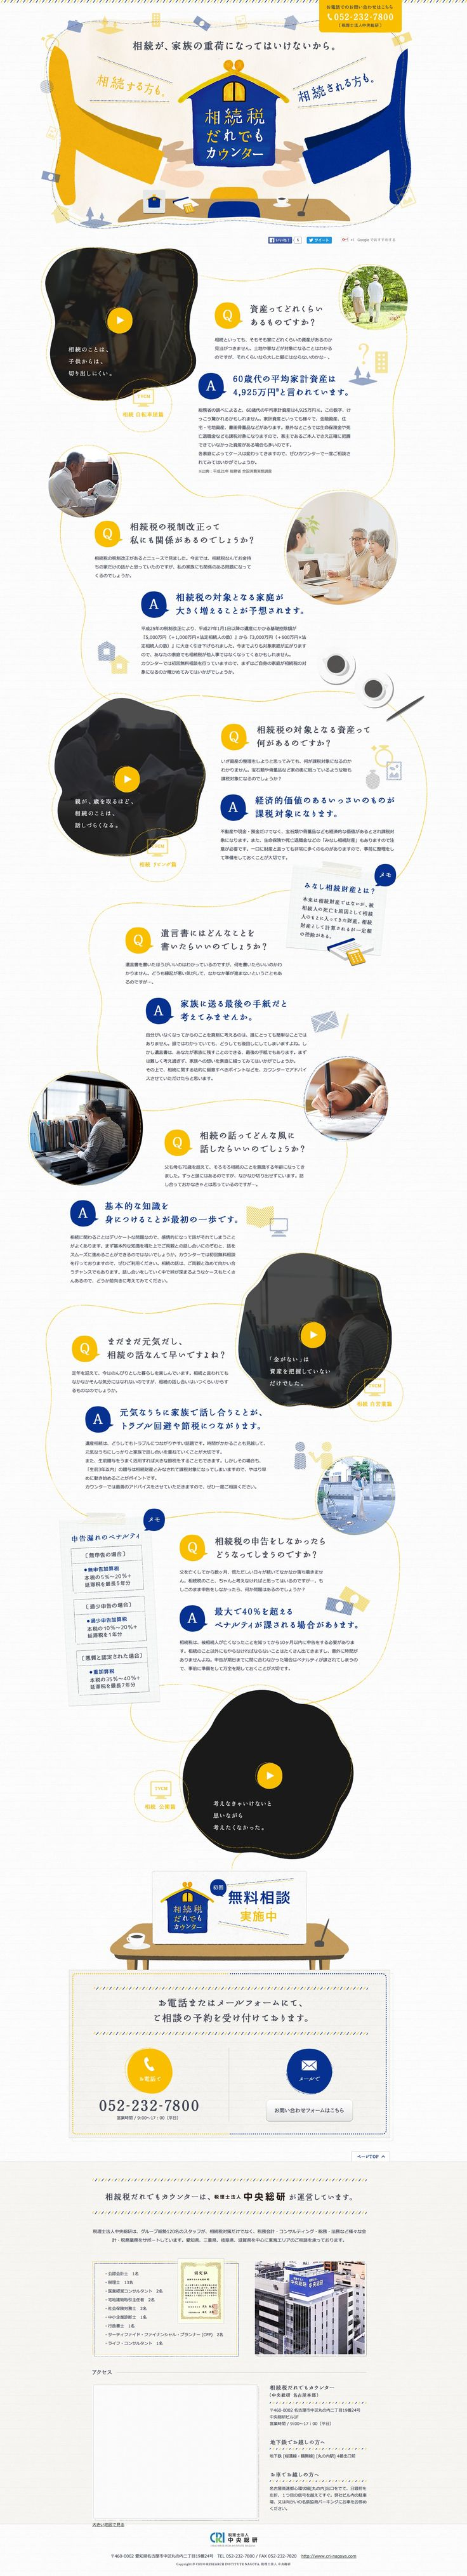 http://www.cri-nagoya.com/sp/souzoku/ イラスト / ガーリー / 手書き / 明朝 / 曲線 / コンタクトボタン / コンタクトエリア / アクセス / 動画 / FAQ / 黄色 / 白 / 紺 / 青 / LP /